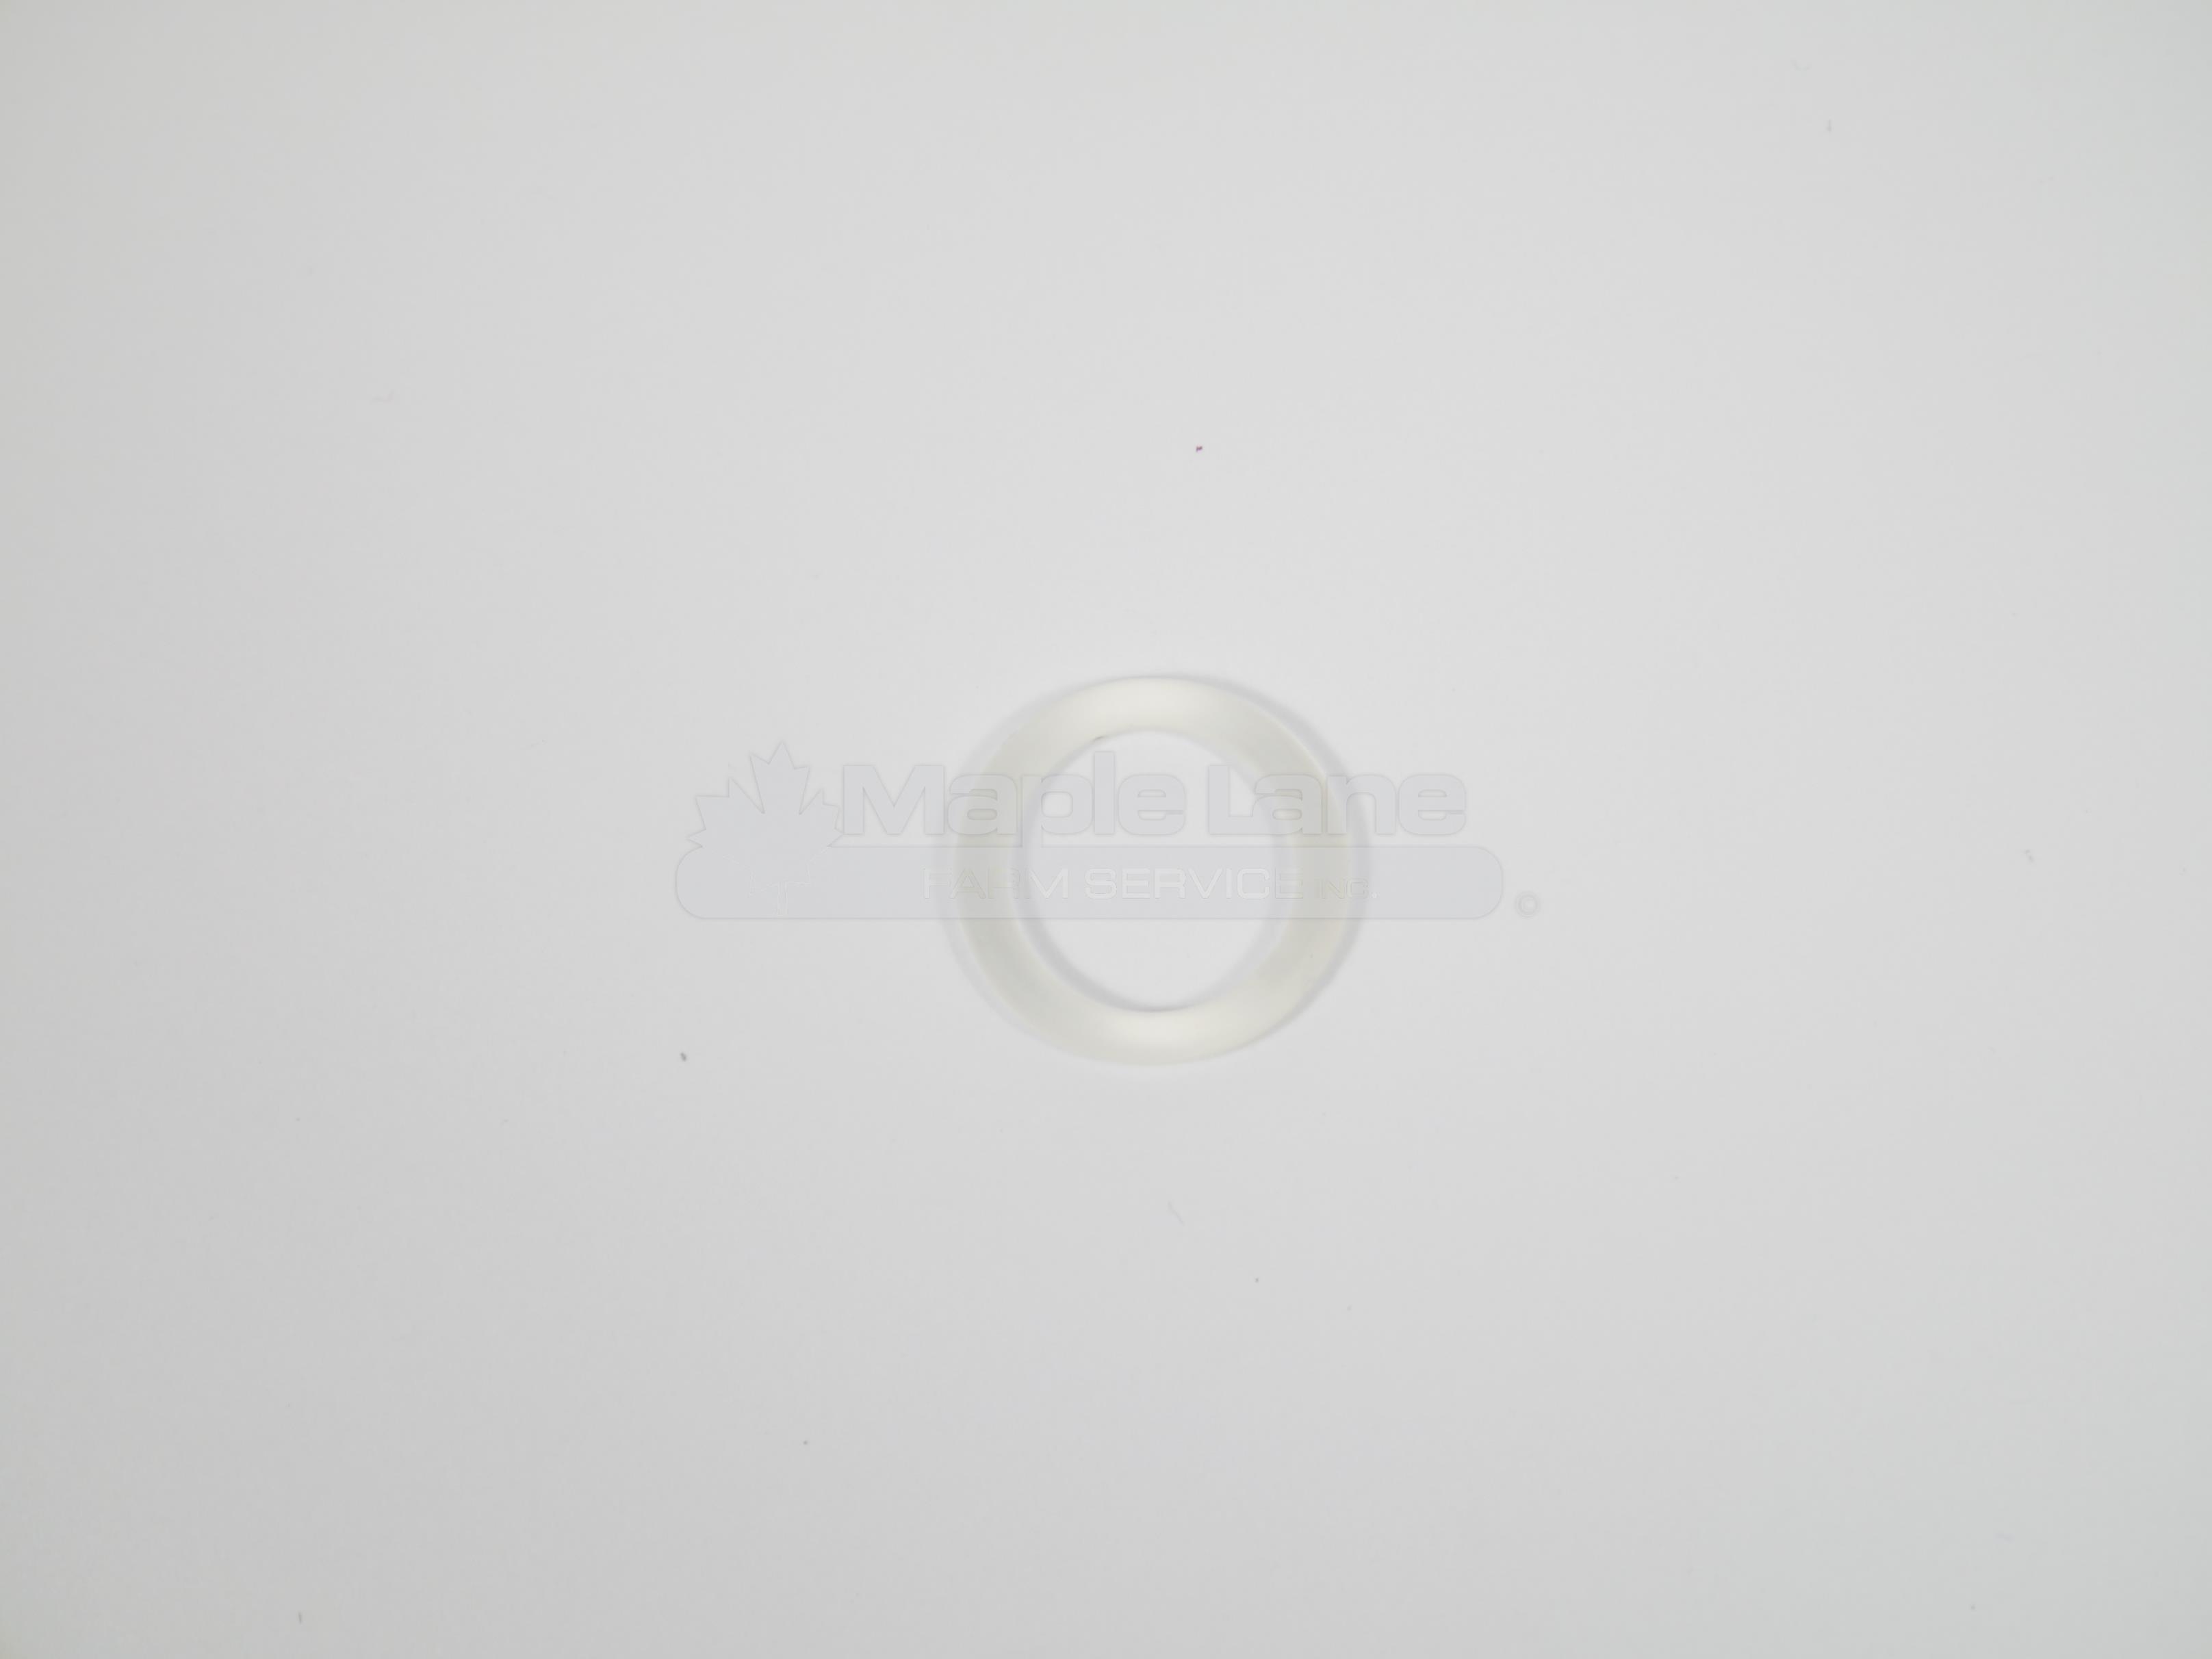 330212 O-Ring